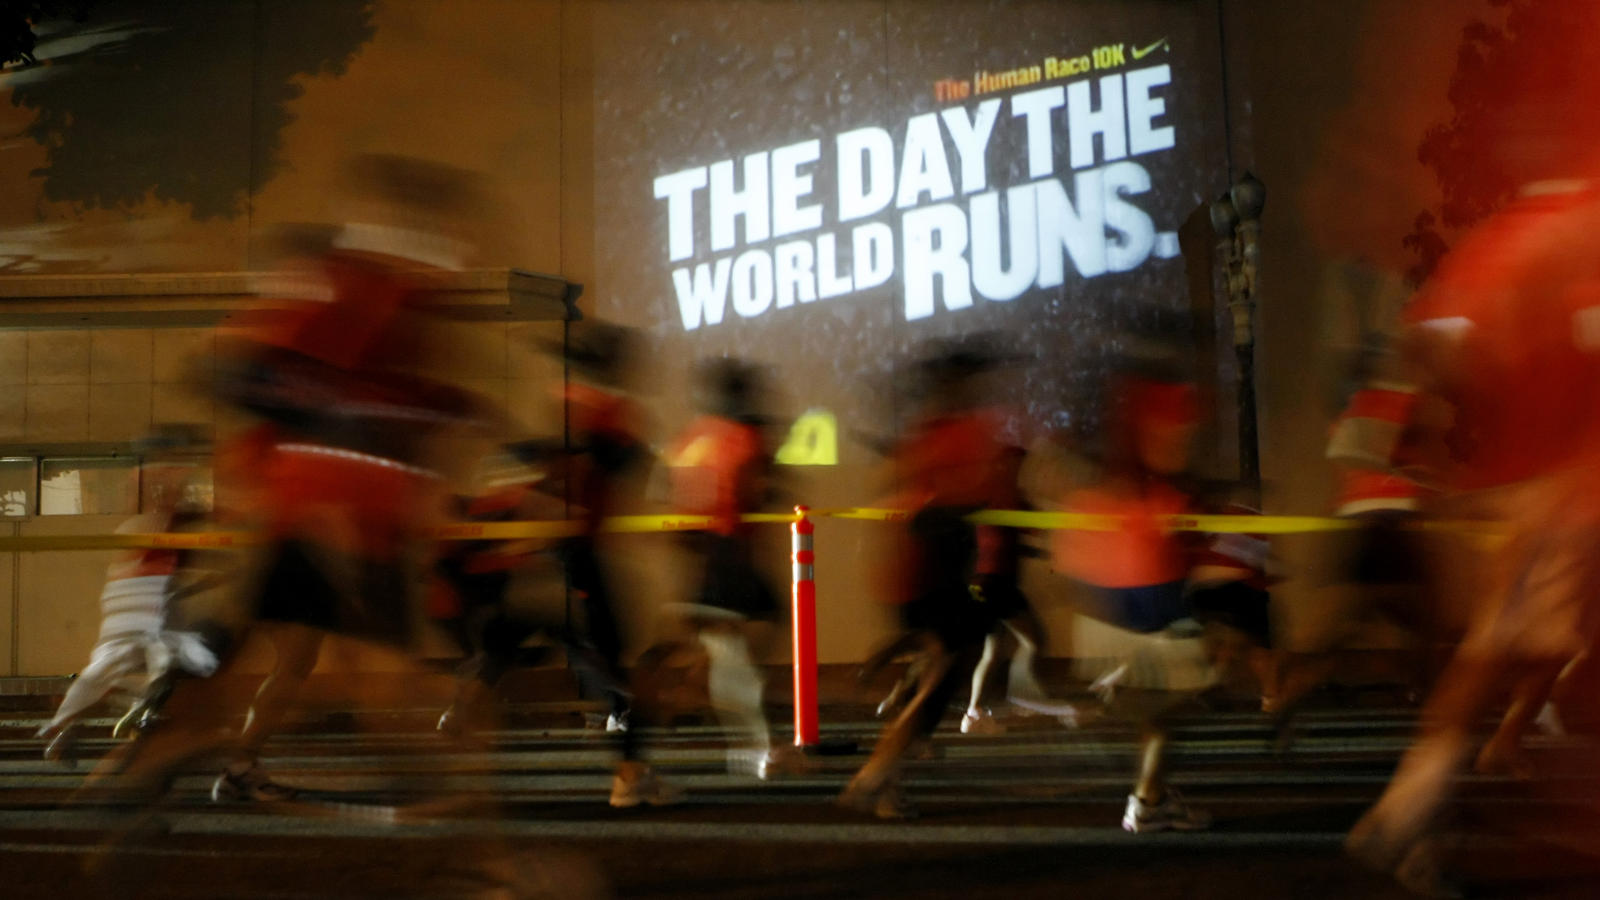 super popular 99f40 db9ec Runners unite for Nike+ Human Race 2009 - Nike News